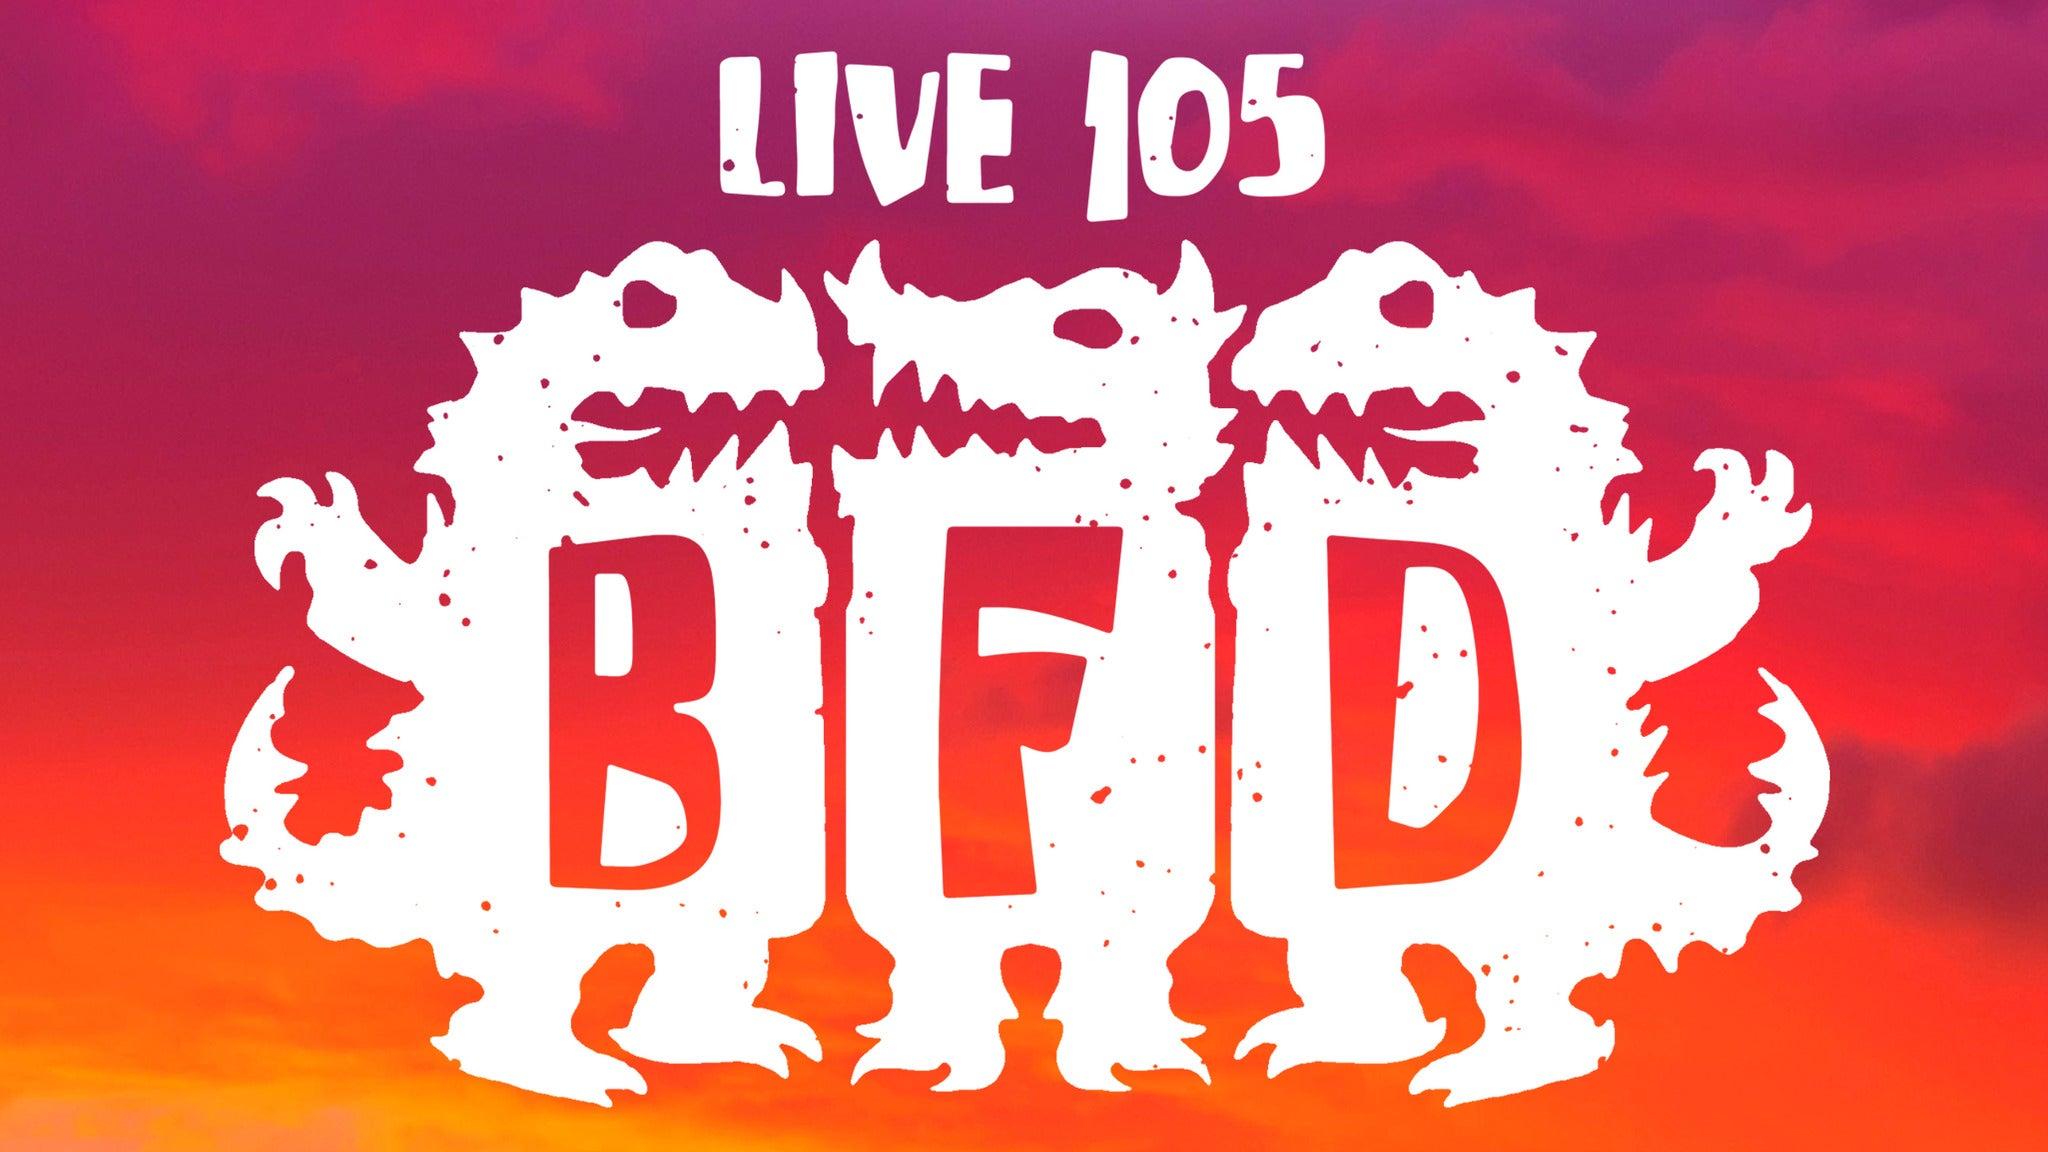 LIVE 105 BFD 2017 at Shoreline Amphitheatre